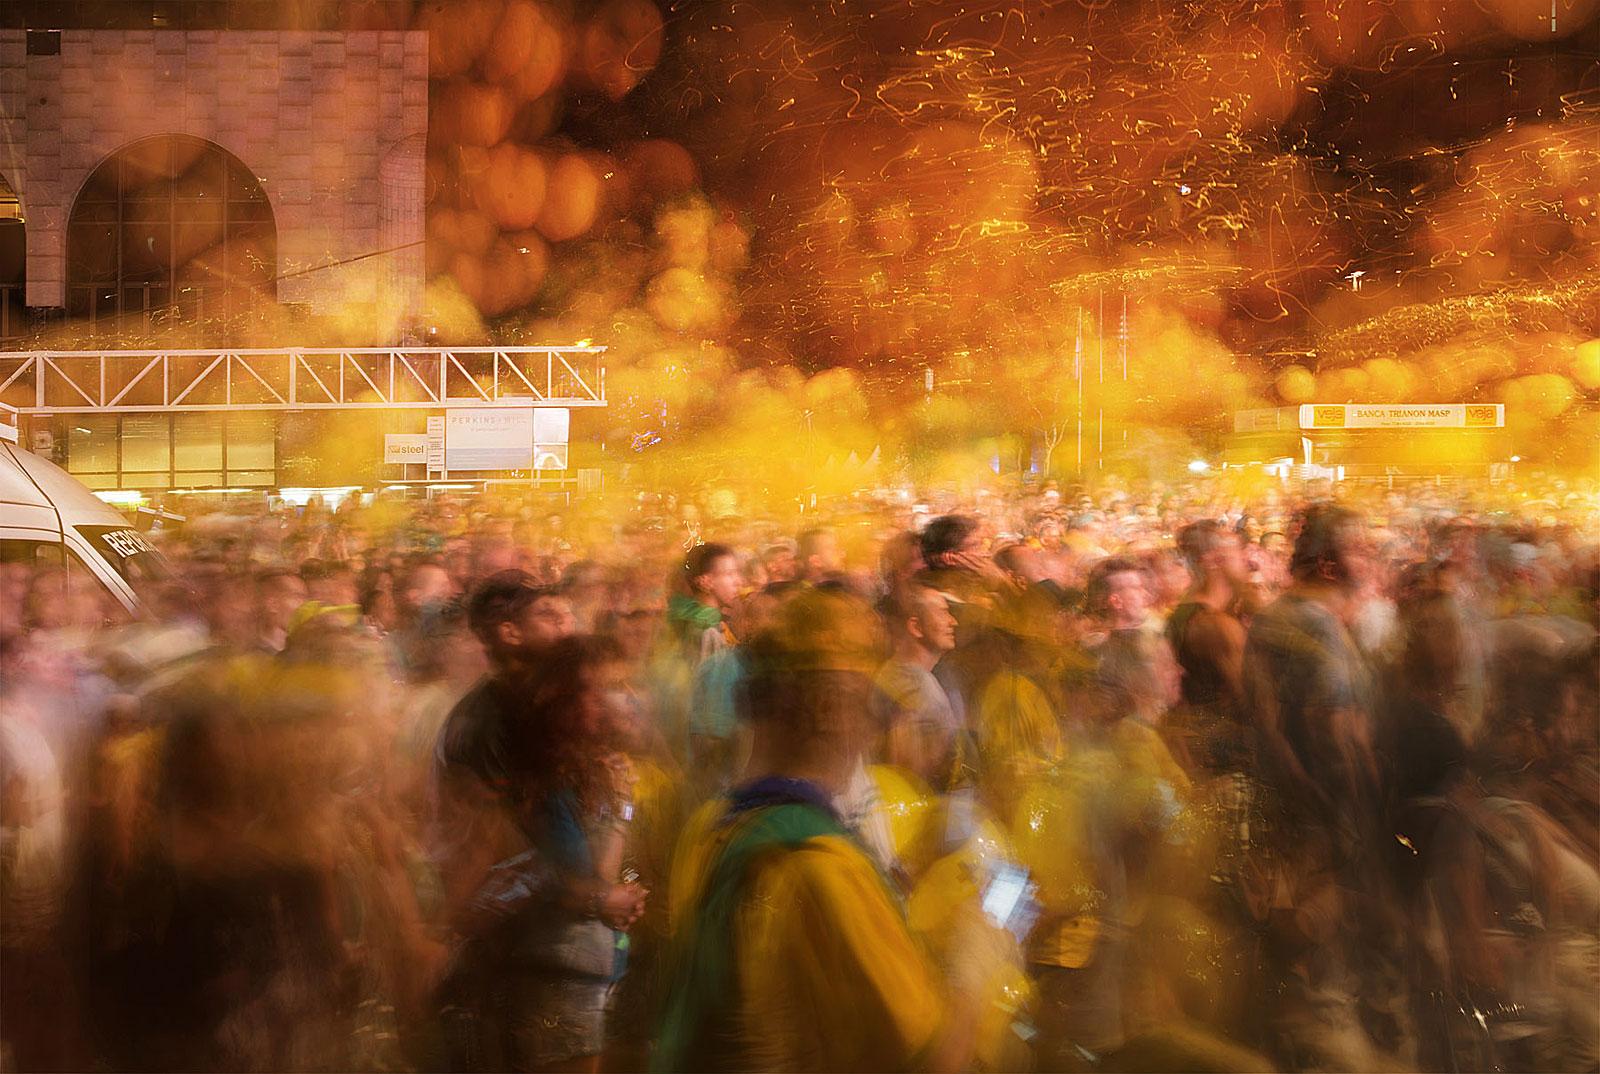 Manifestação, Avenida Paulista (19.37 - 19.57 Uhr, 17.4.2016)